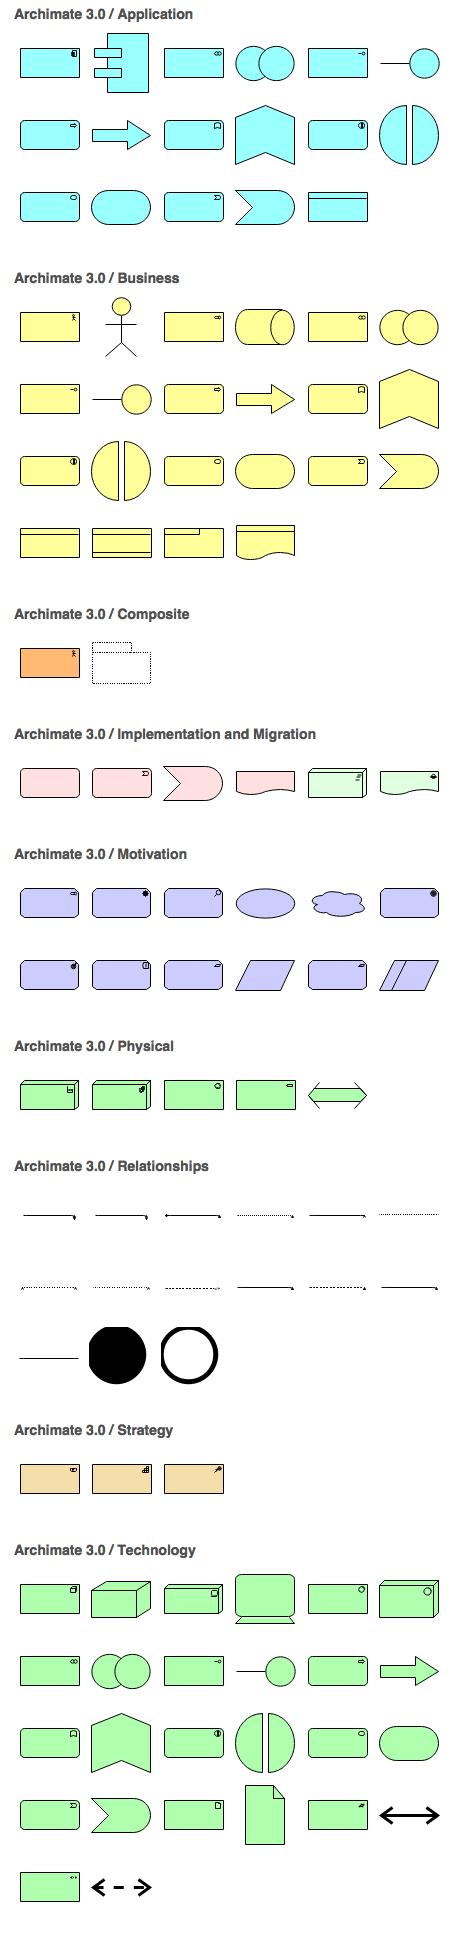 sidebar-archimate3